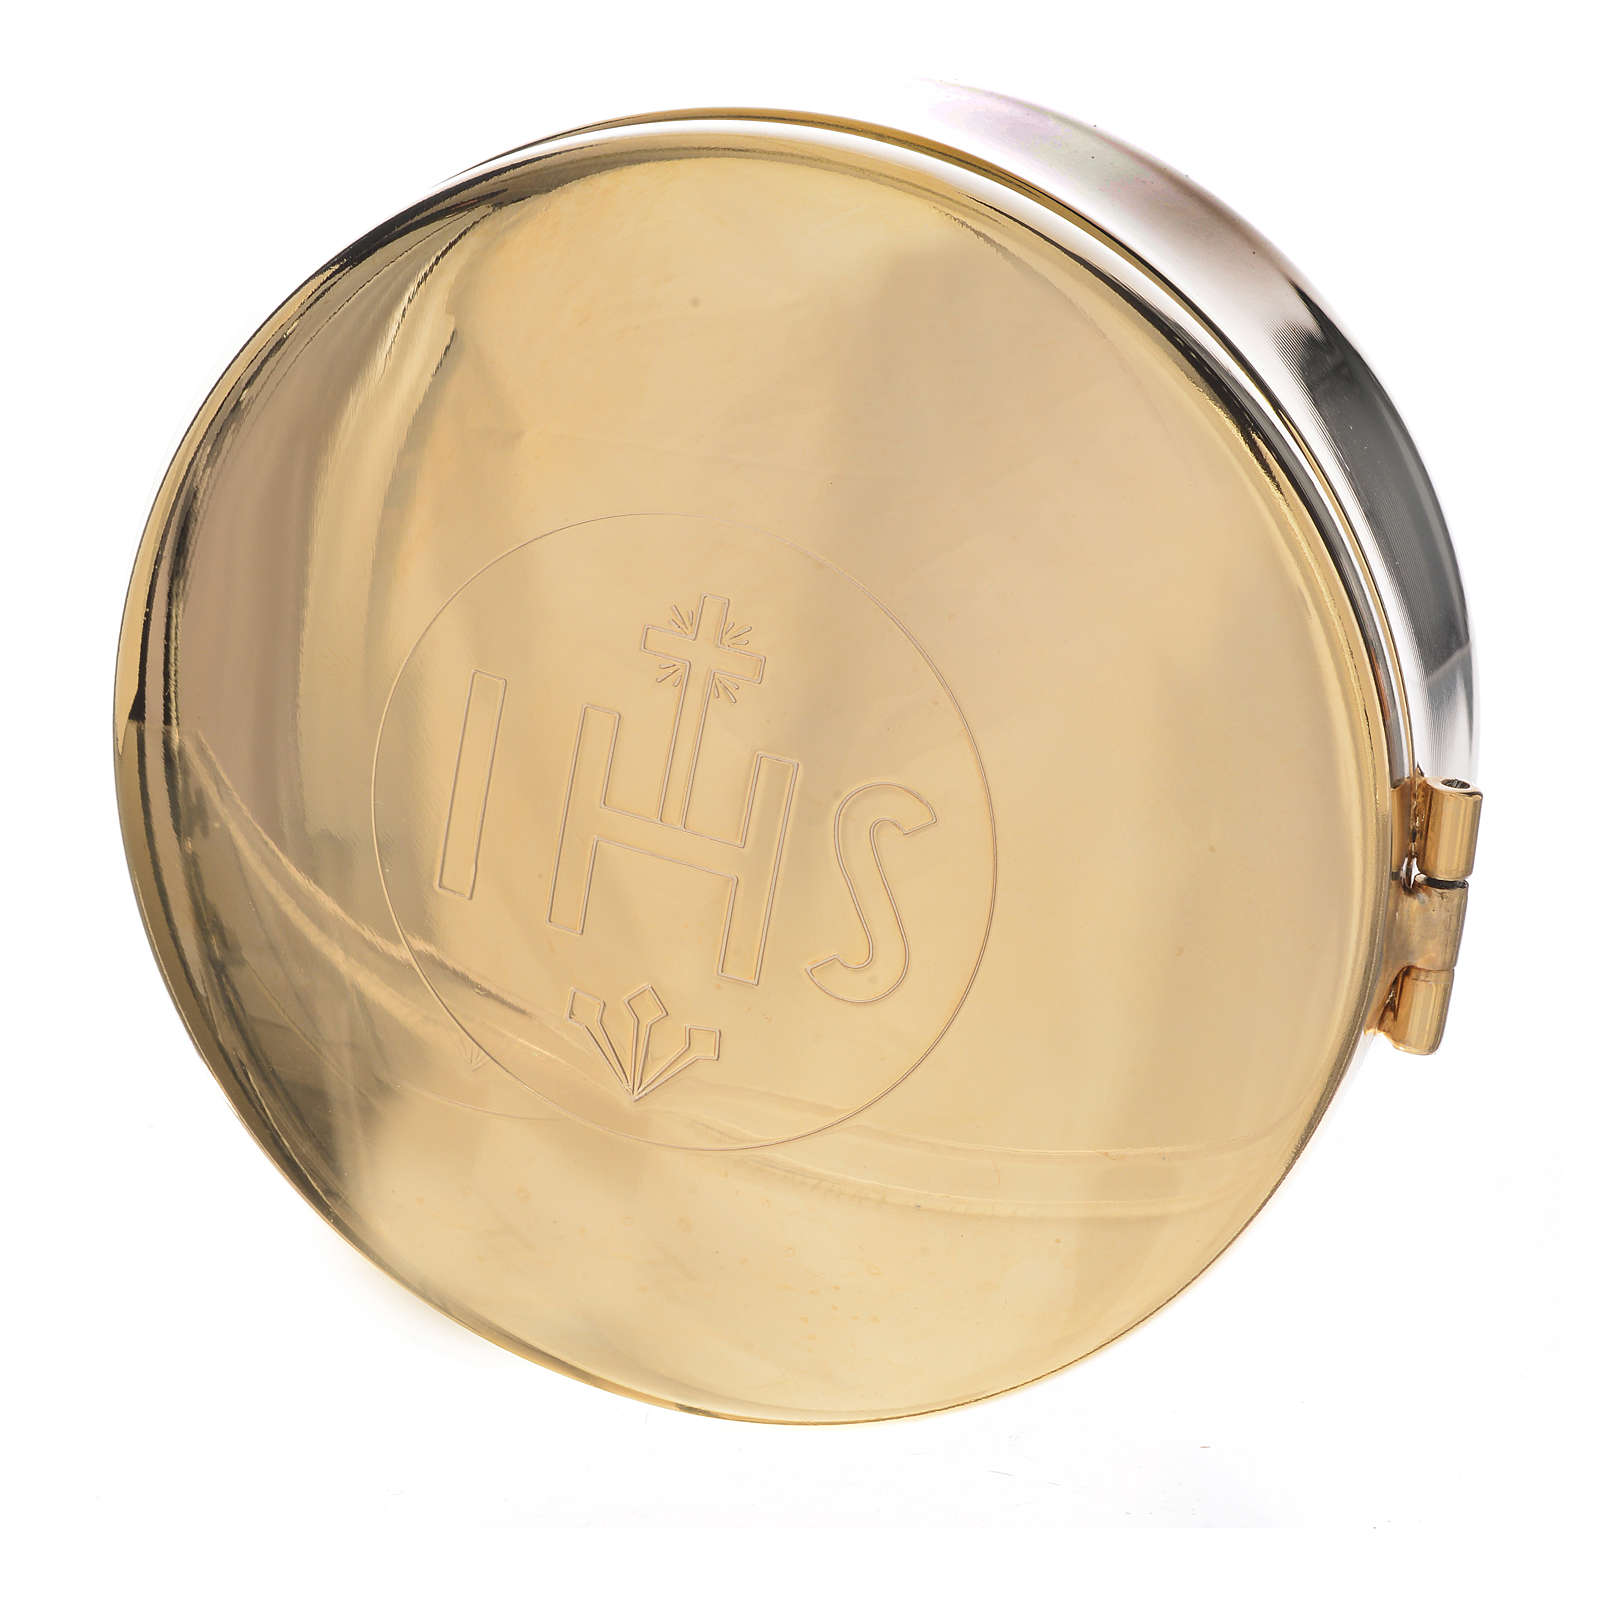 Scatola portaostie ottone diam 9,5 cm 4